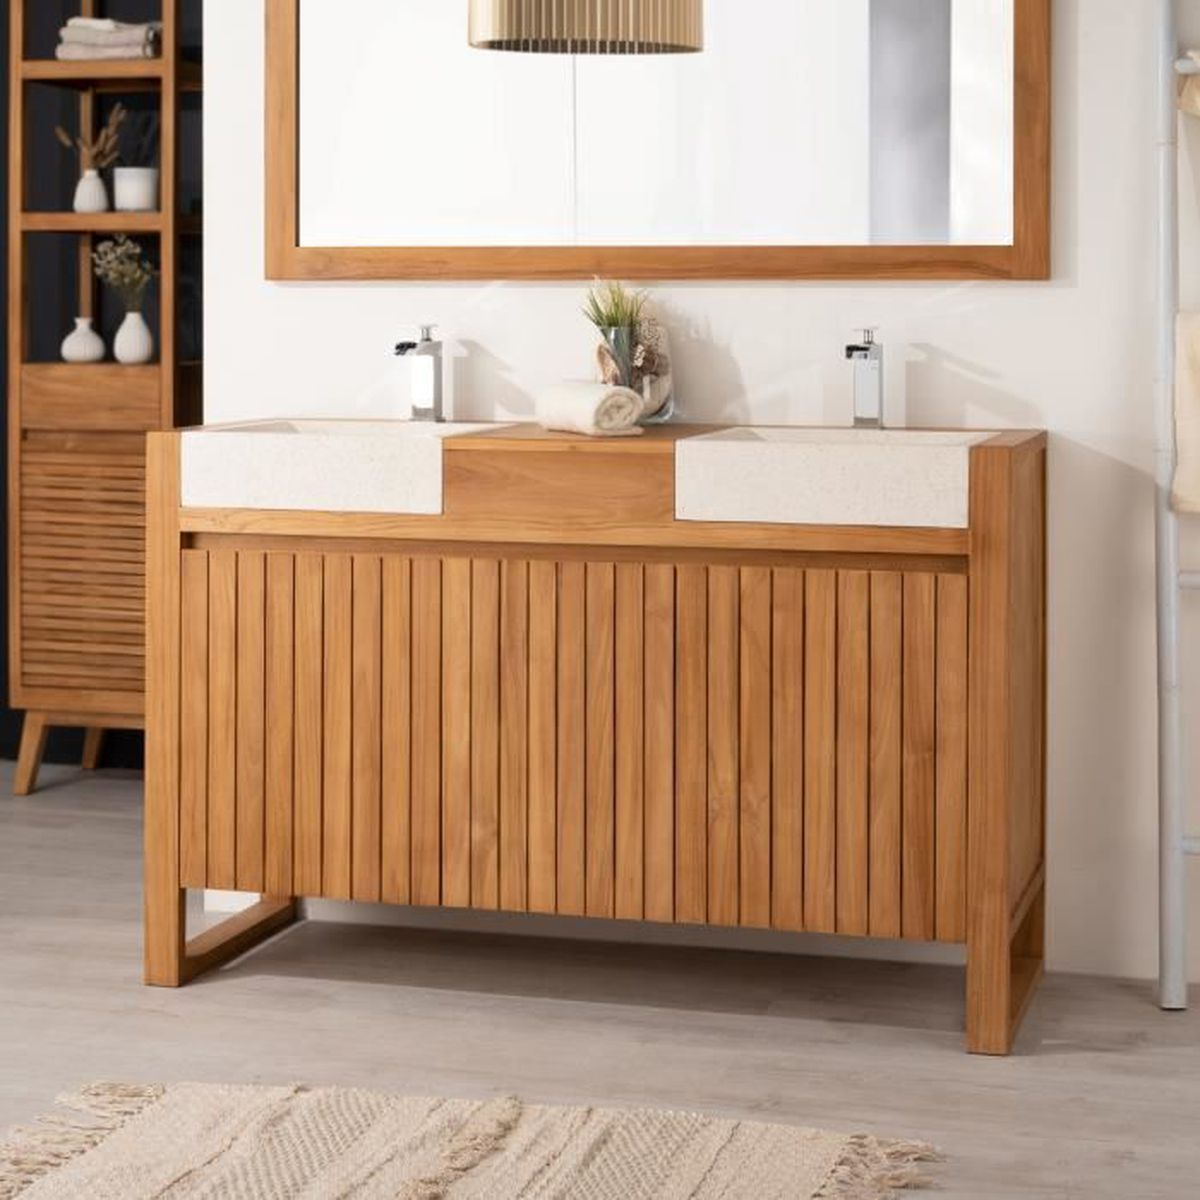 meuble en teck salle de bain achat vente meuble en teck salle de bain pas cher les soldes. Black Bedroom Furniture Sets. Home Design Ideas